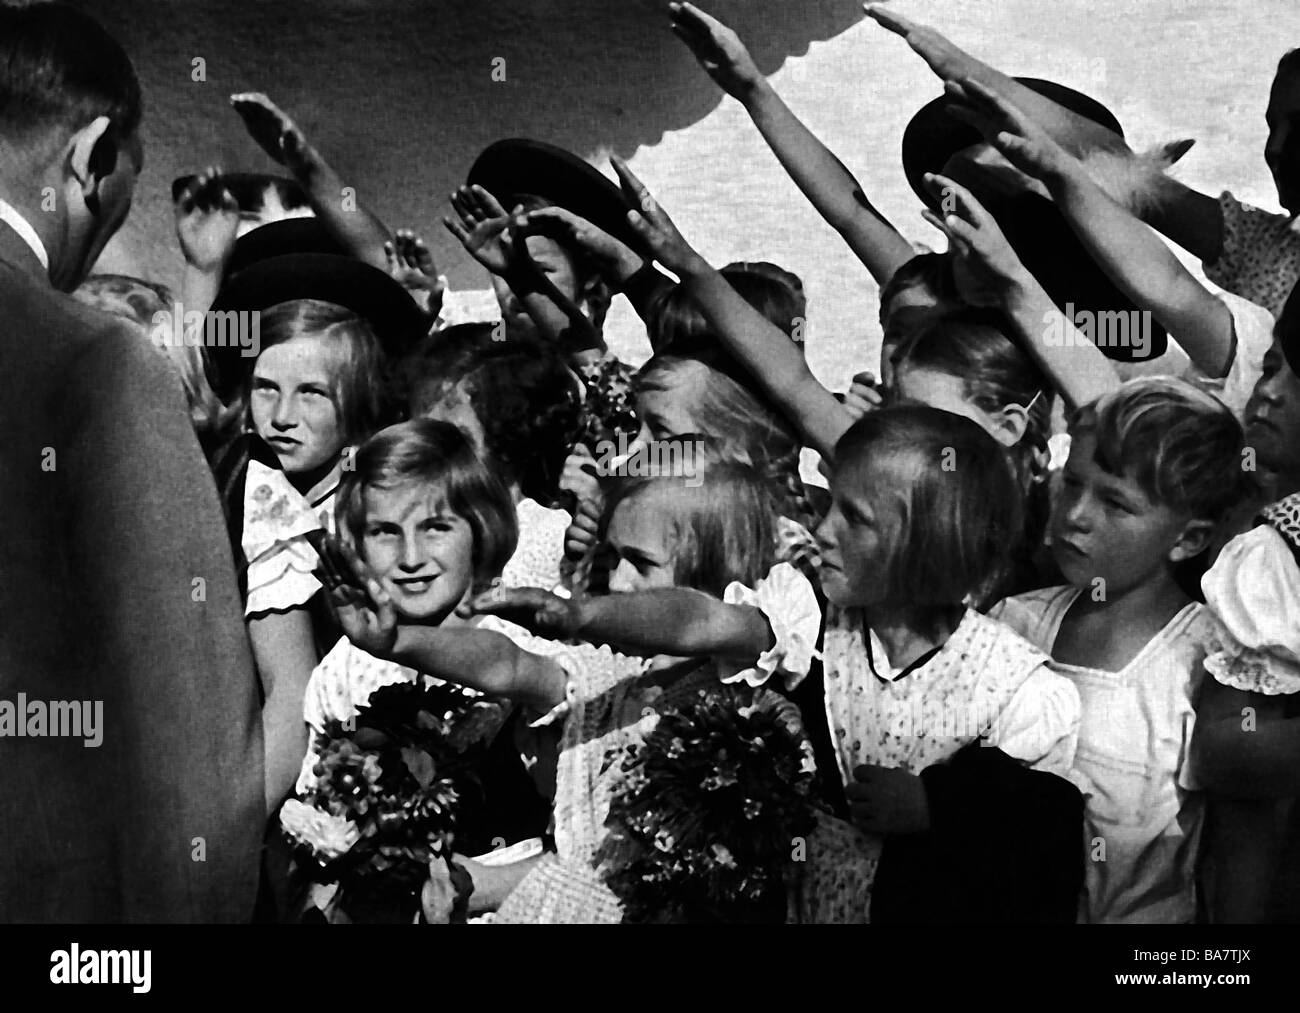 Hitler, Adolf, 20.4.1889 - 30.4.1945, German politician (NSDAP), children saluting him, Additional-Rights-Clearances - Stock Image